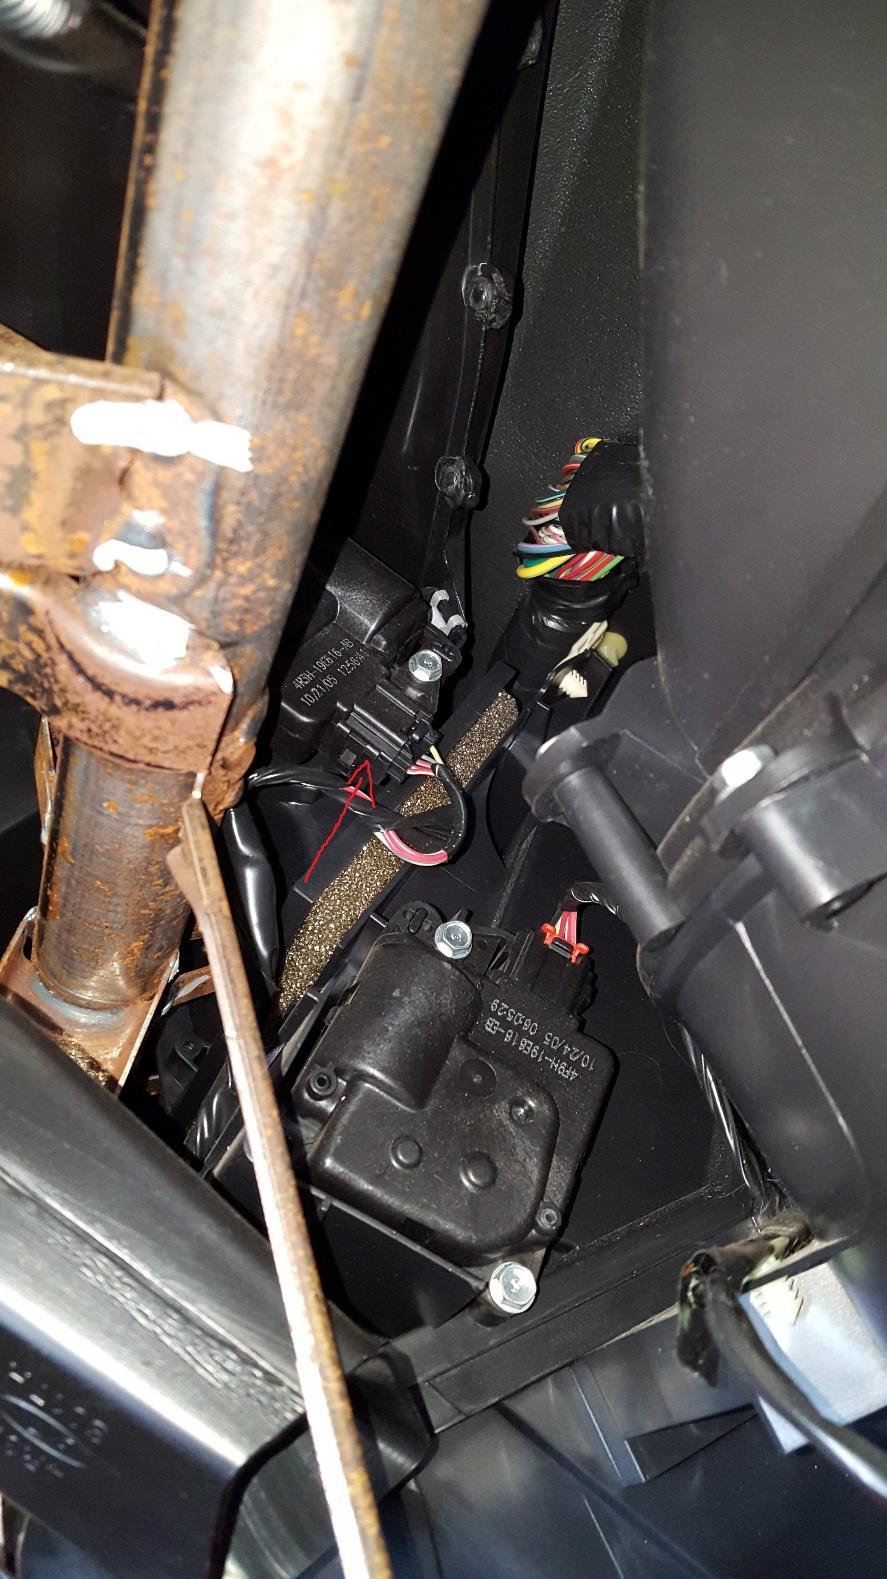 how to install an hvac blend door actuator - defrost